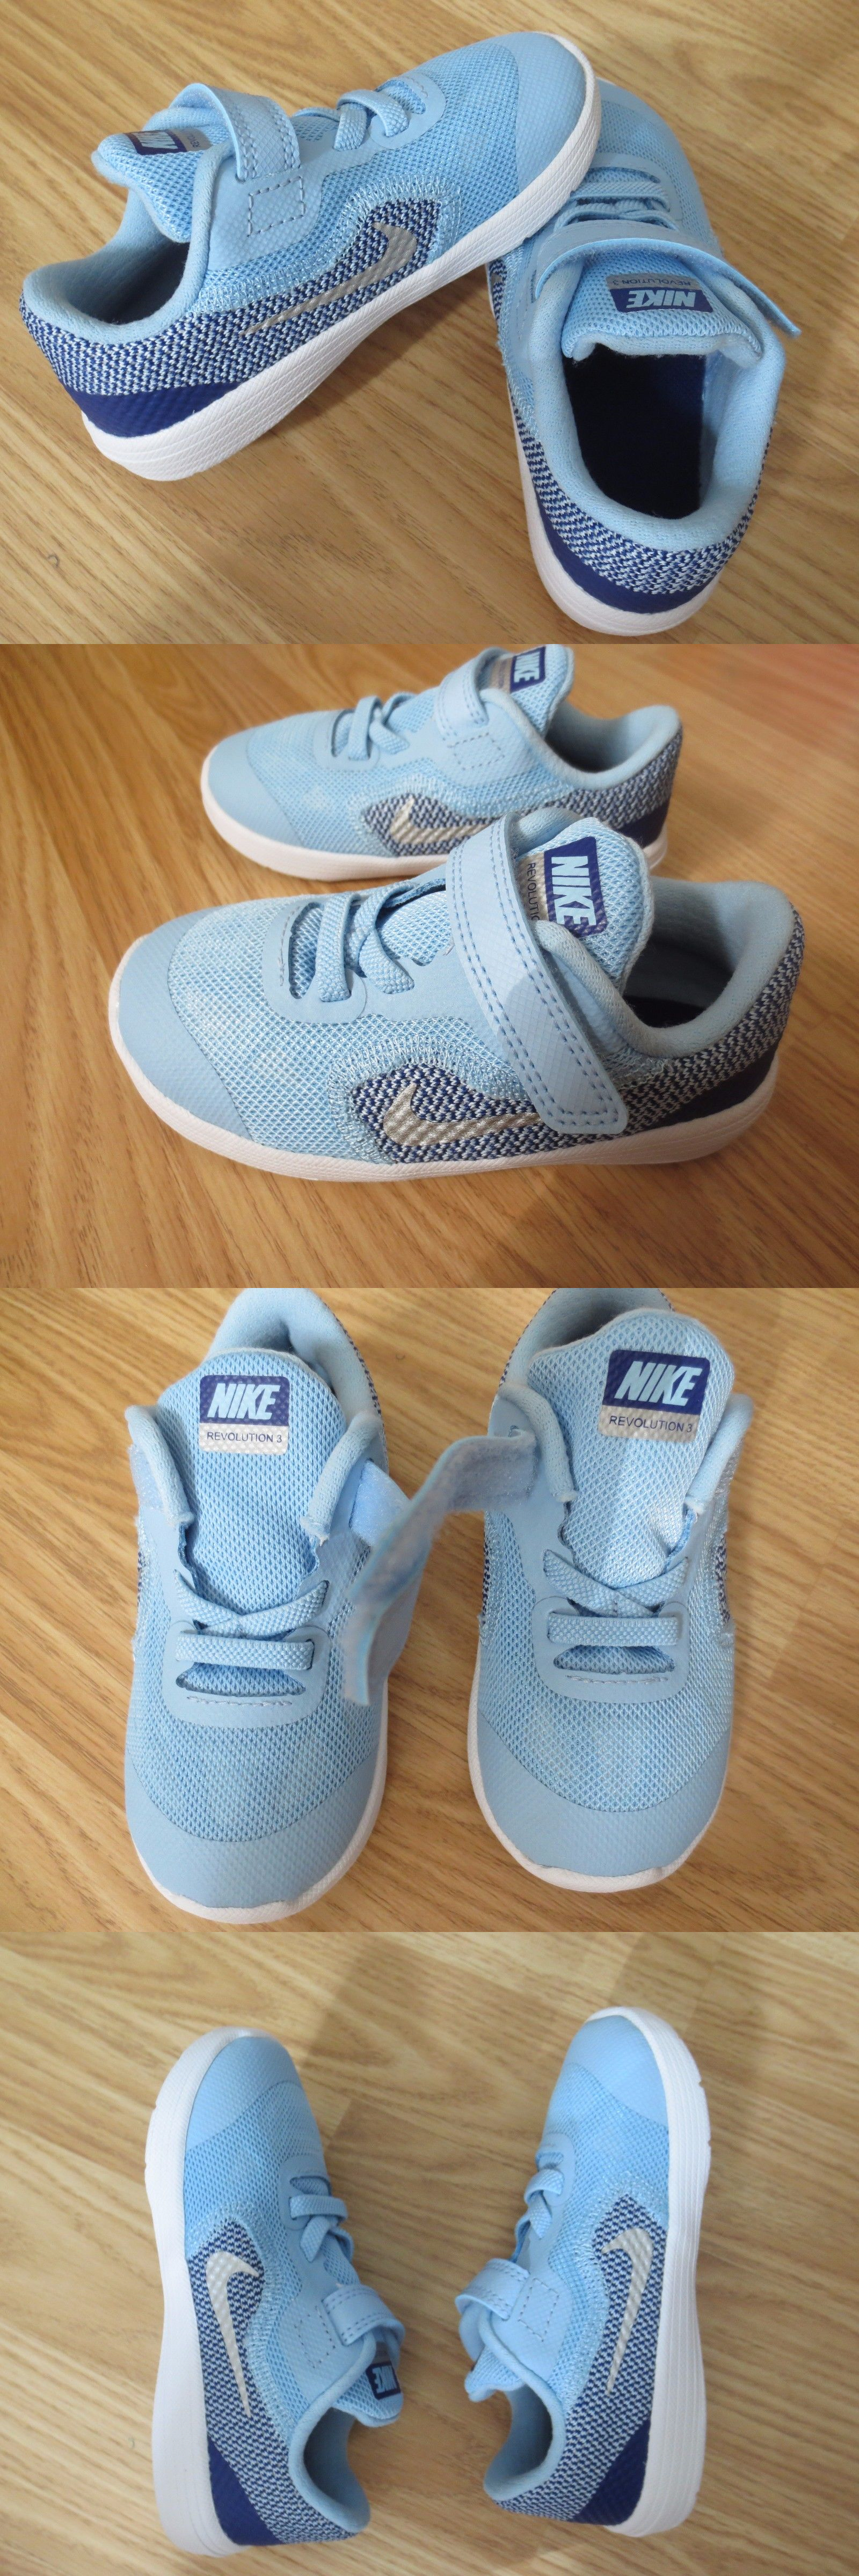 Baby Shoes Nike Revolution 3 Tdv Toddler Size 8C Baby Blue